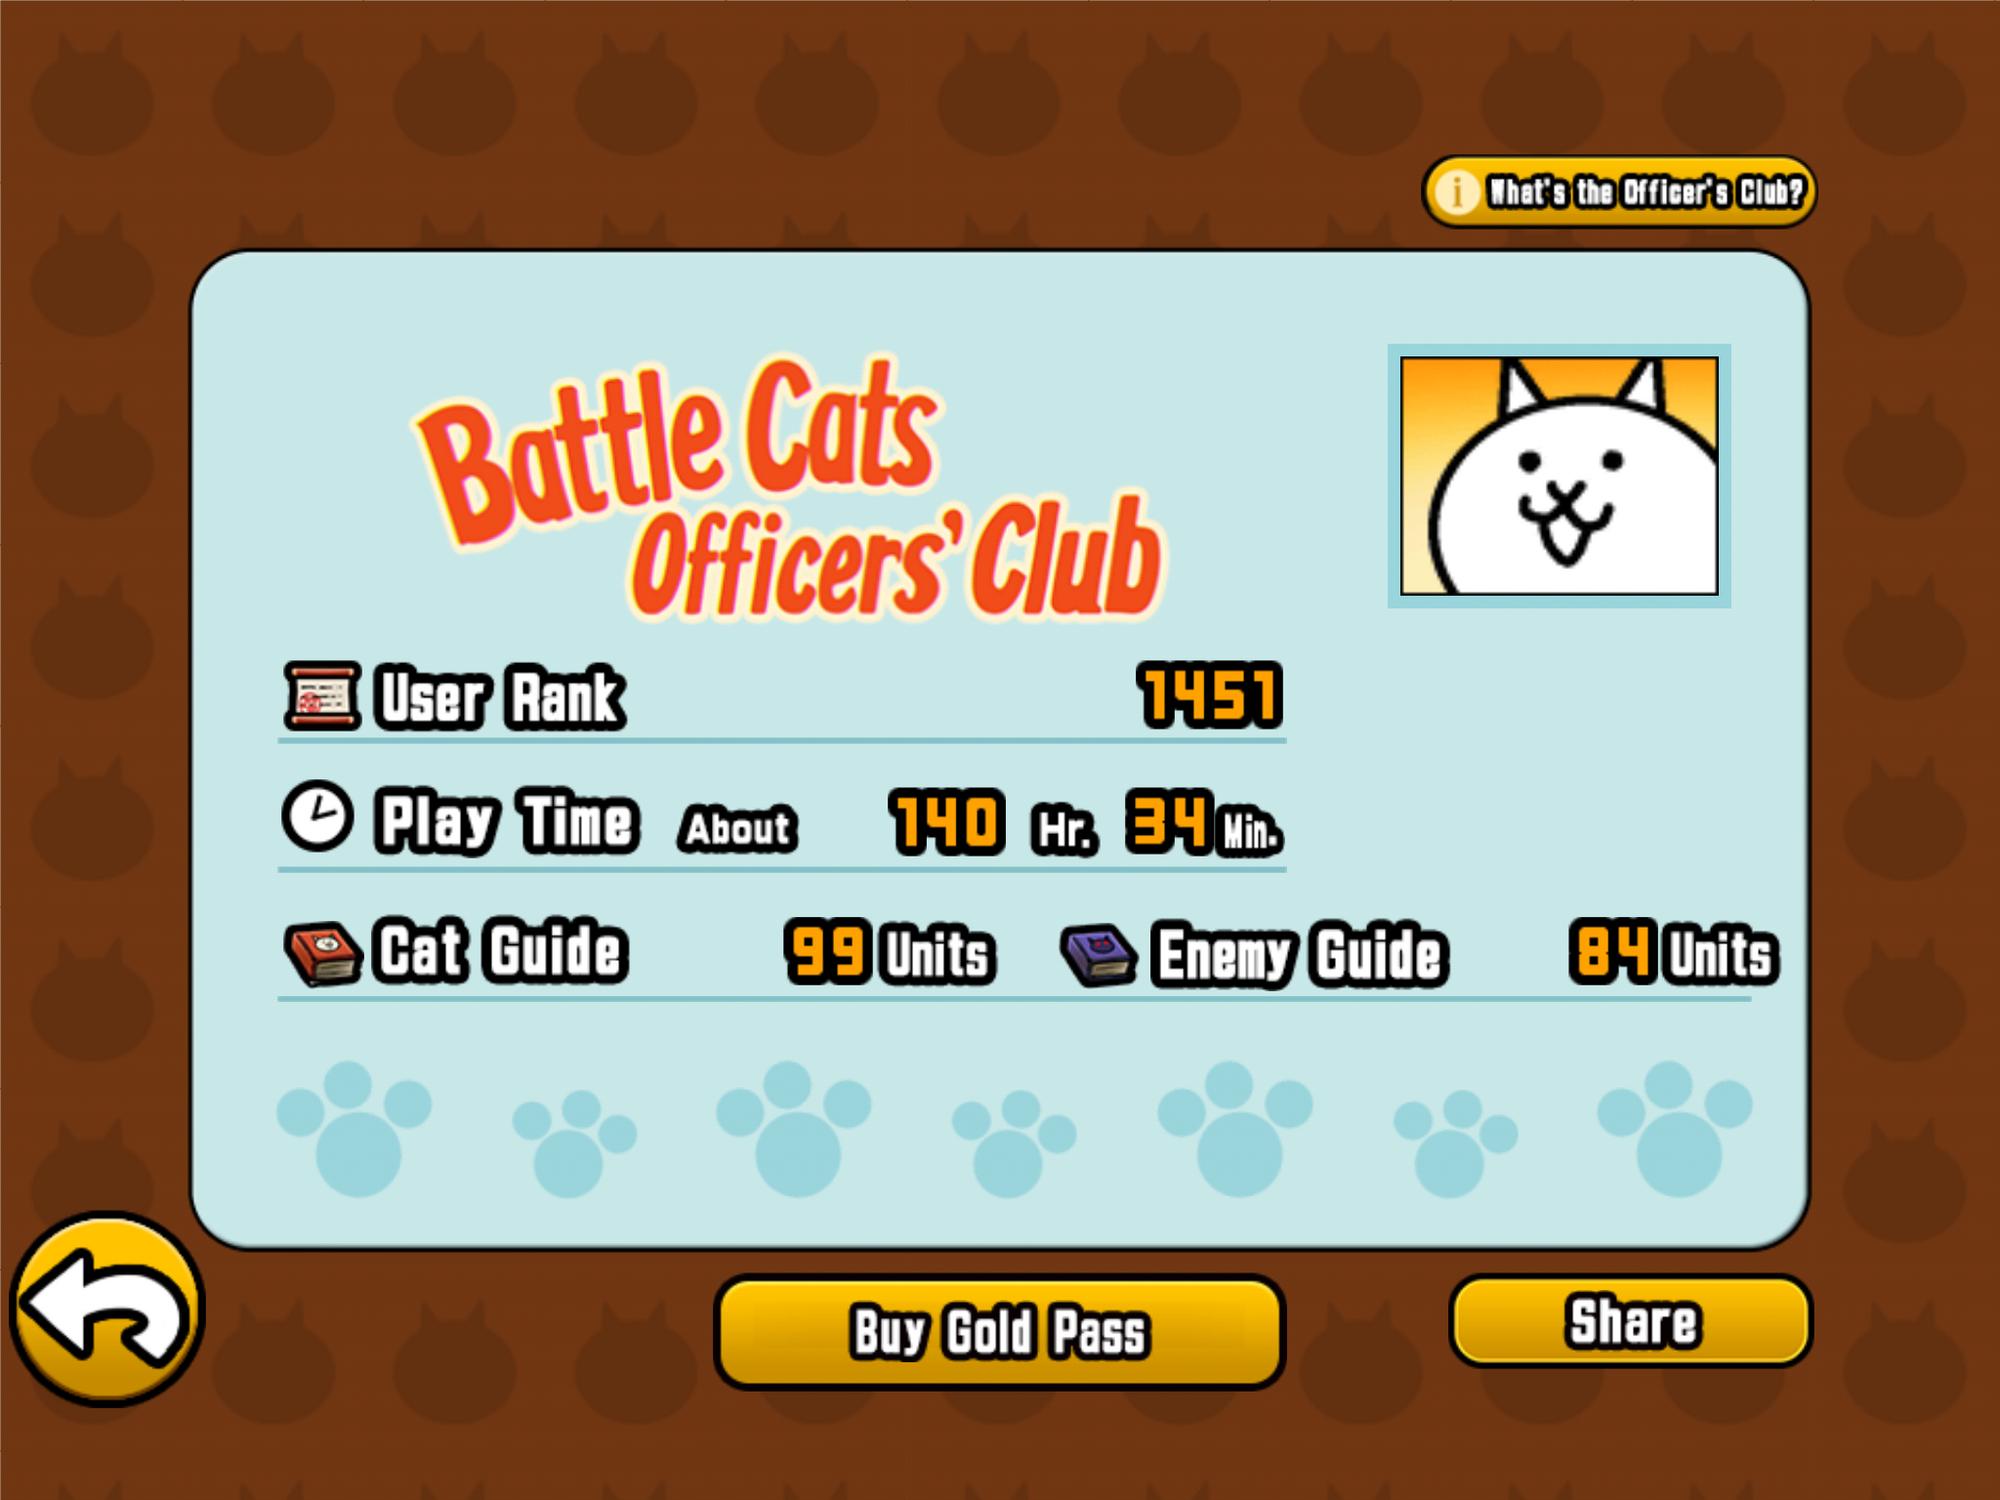 Officers Club Battle Cats Wiki Fandom Powered By Wikia